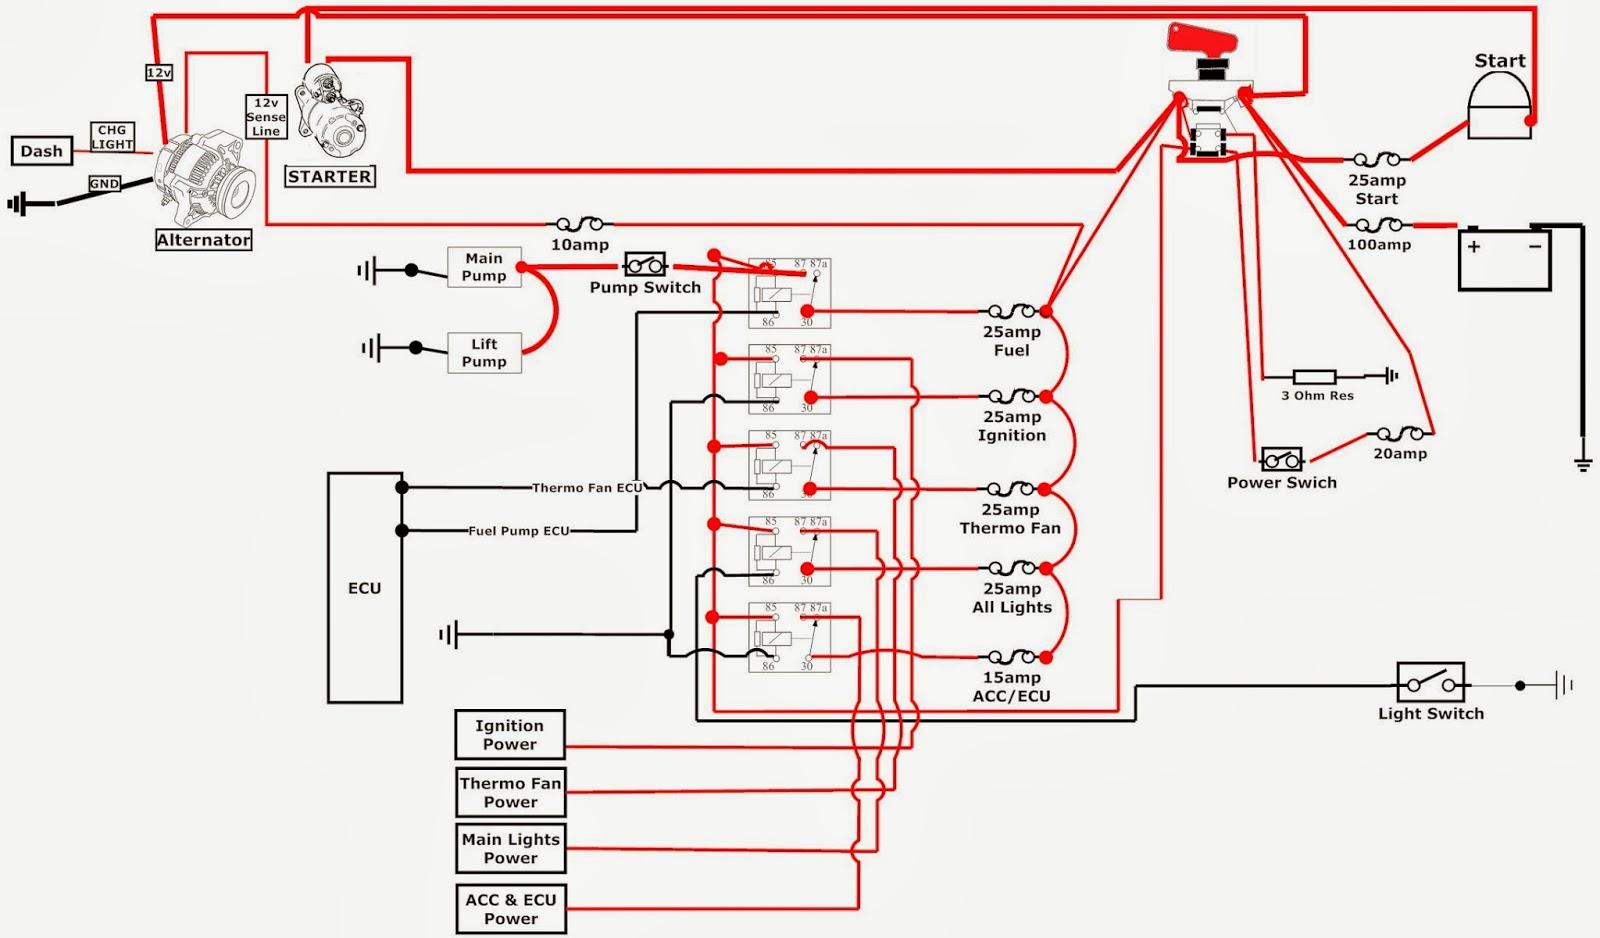 Nissan Vg30e Wiring Diagram : Awesome nissan vg e engine diagram contemporary best